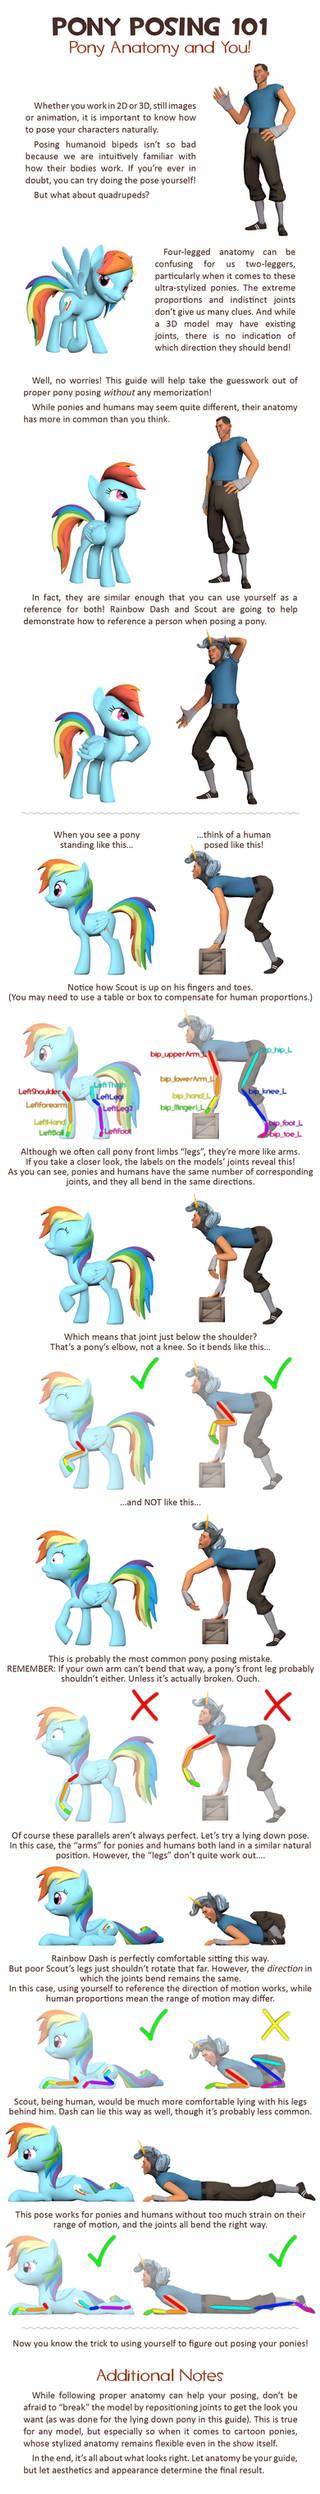 Pony Posing 101